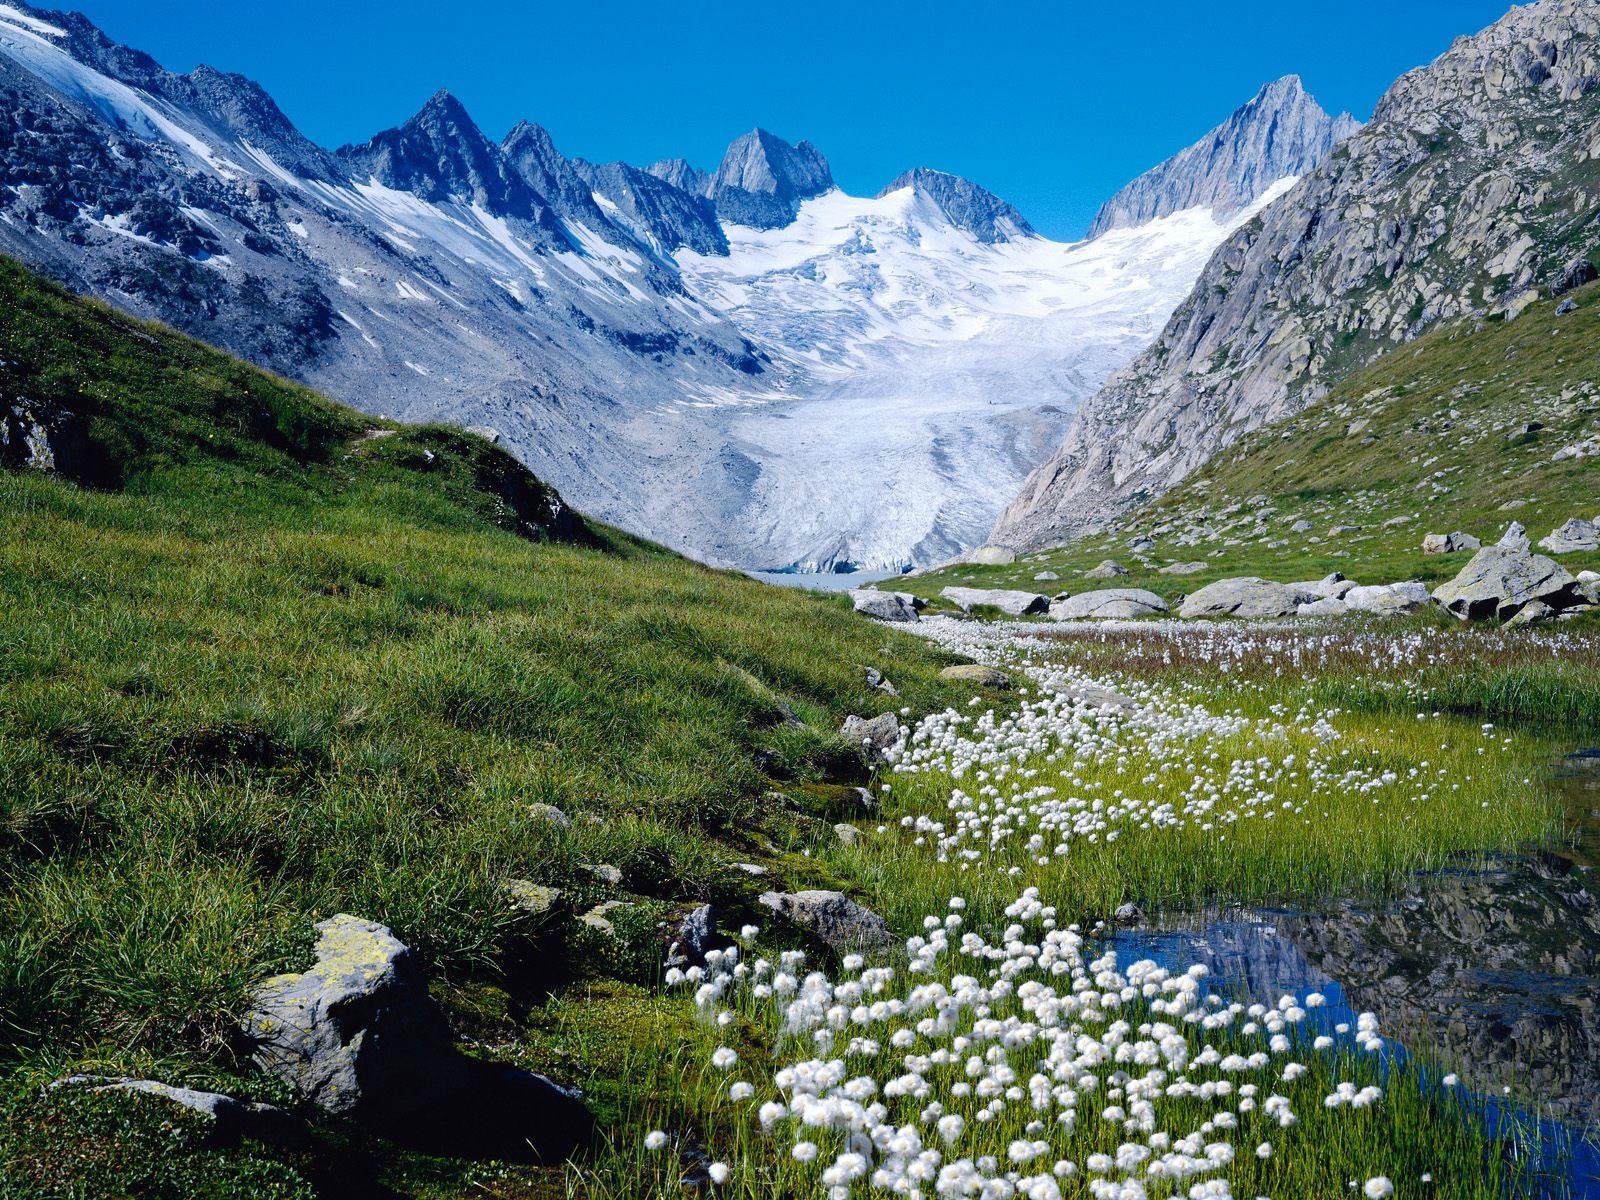 http://3.bp.blogspot.com/-REa-_jKwUu8/T5cAYIaRNSI/AAAAAAAADds/evgR4M-P2_0/s1600/HD+Mountain+Spring+Wallpapers.jpg